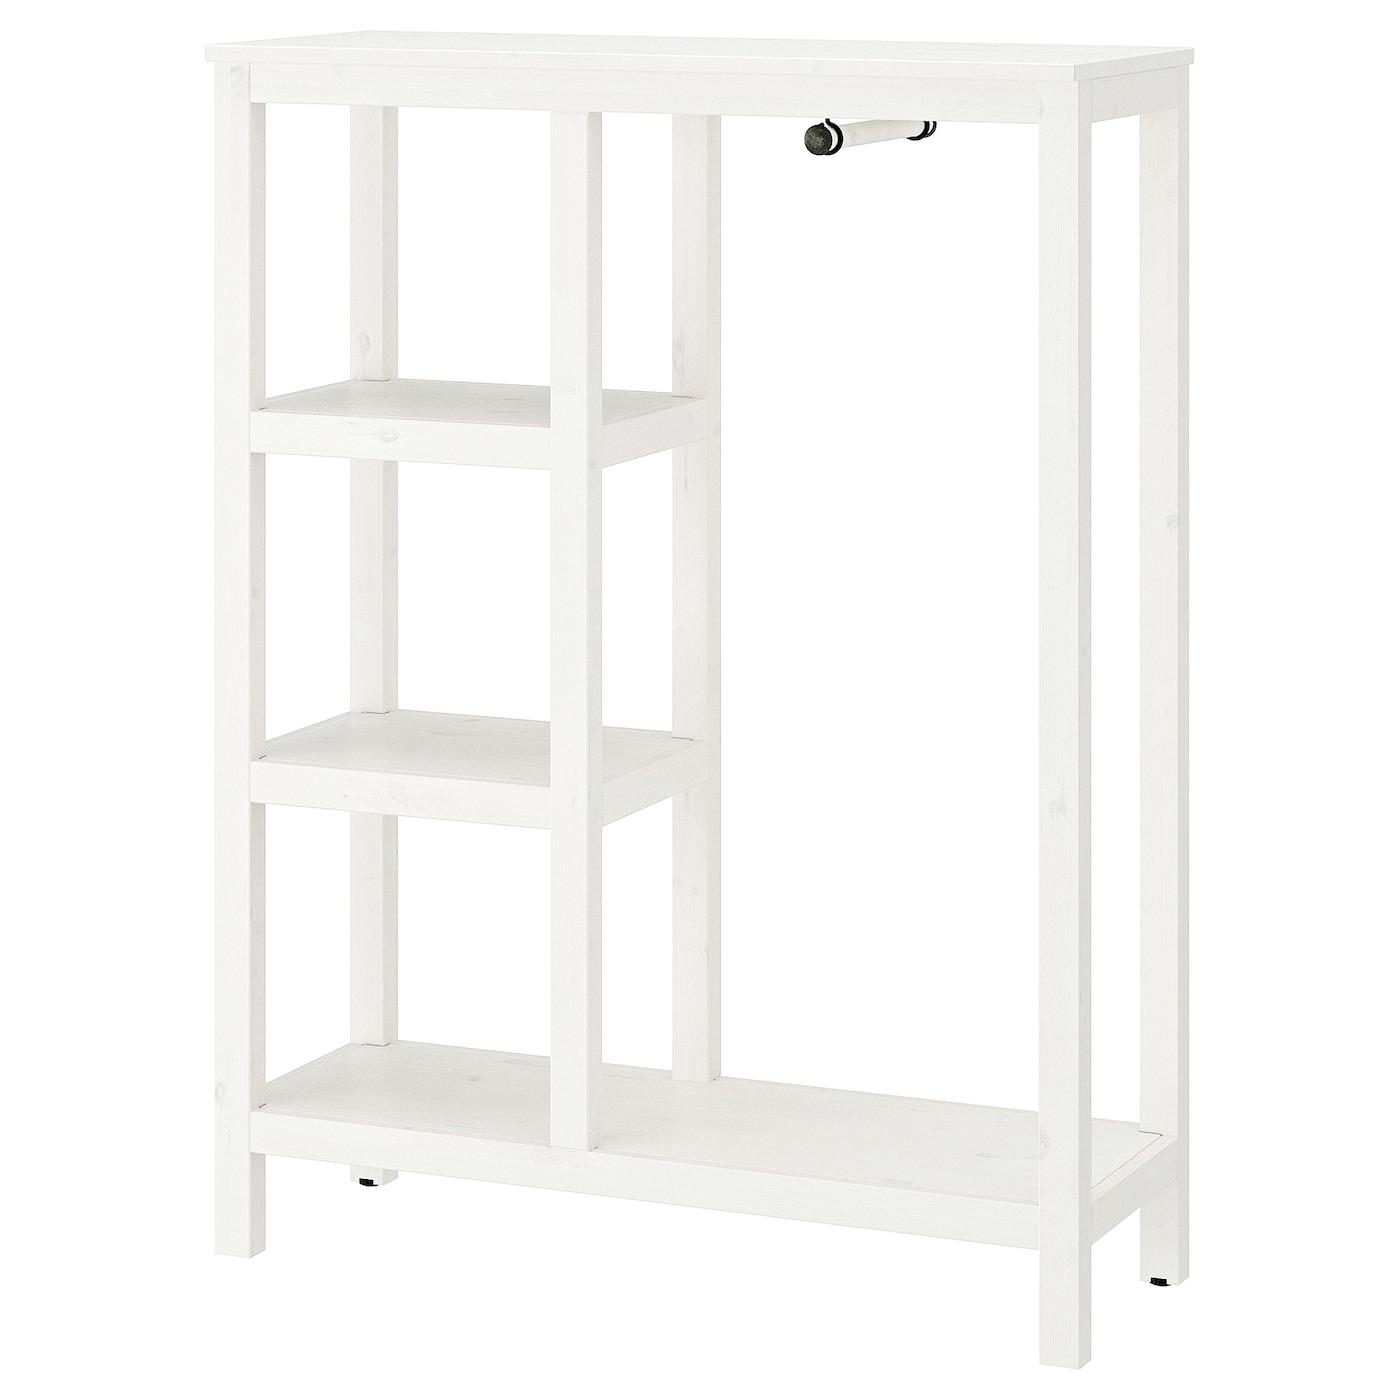 Hemnes armario abierto tinte blanco 99 x 37 x 130 cm ikea for Hemnes guardaroba